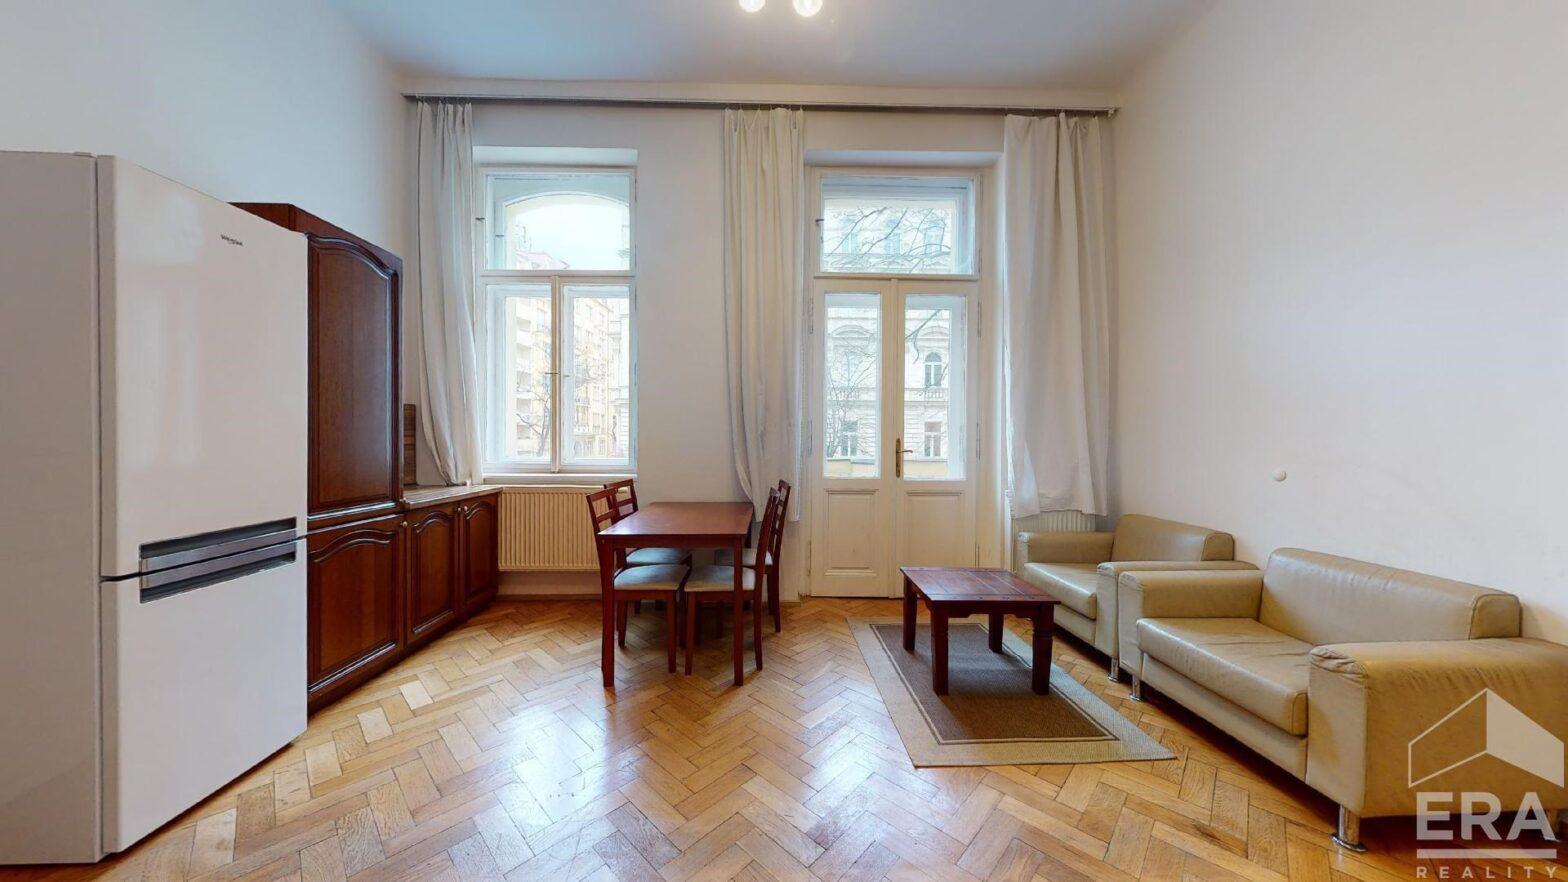 Pronájem bytu 3+kk, 70 m2, v ul. Vinohradská, Praha 2.